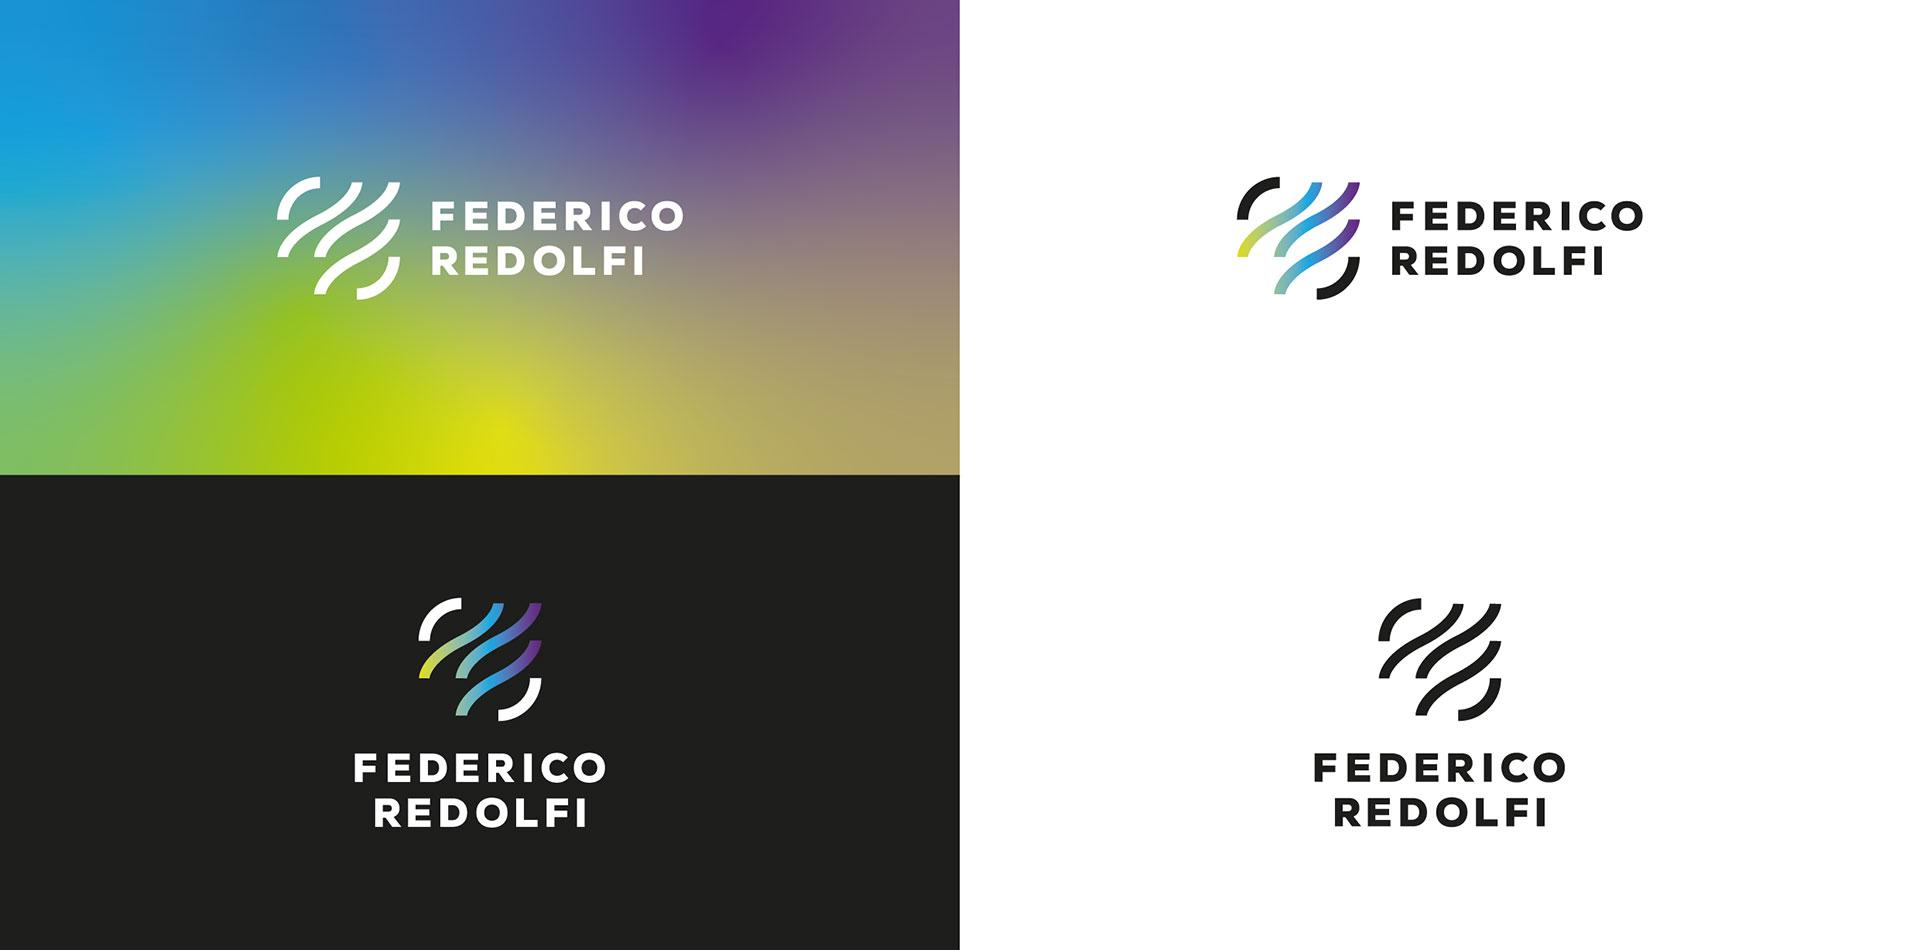 federico-redolfi-loghi-big